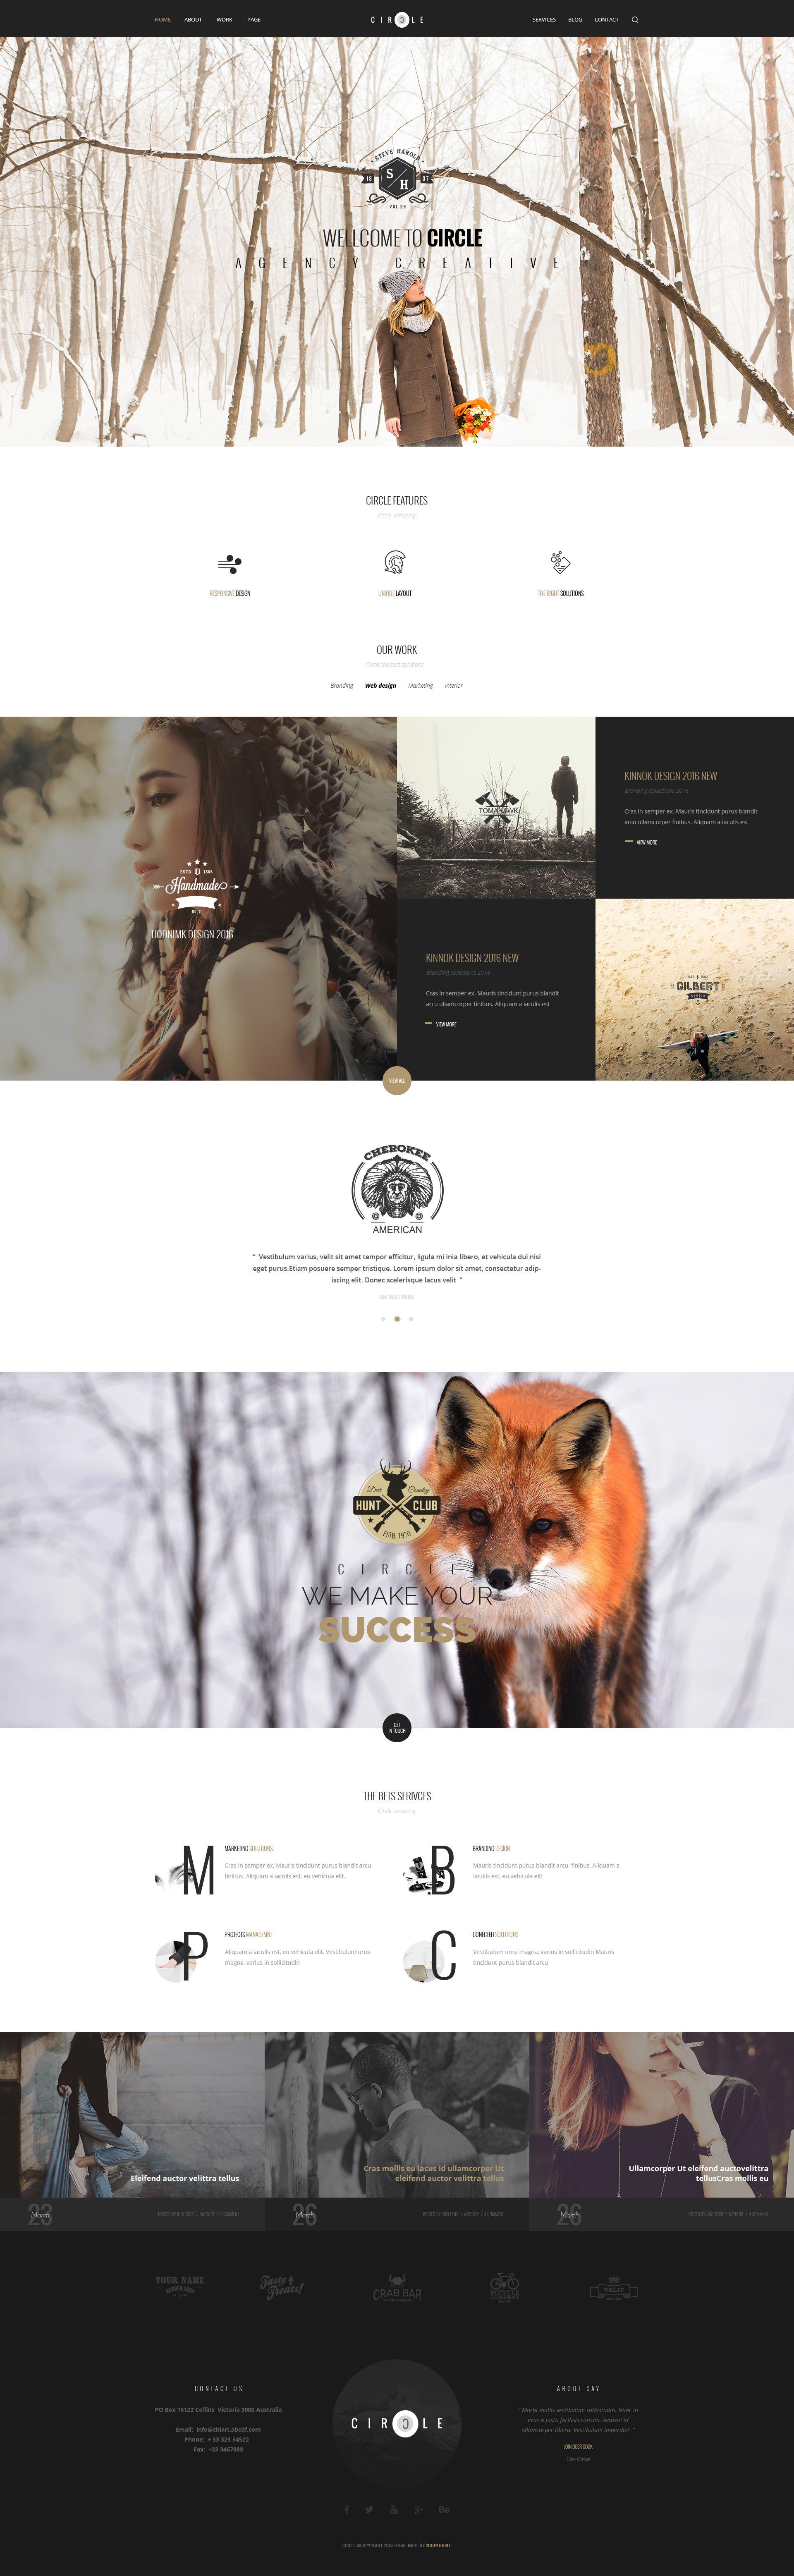 CIRCLE - Creative Multipurpose PSD Template